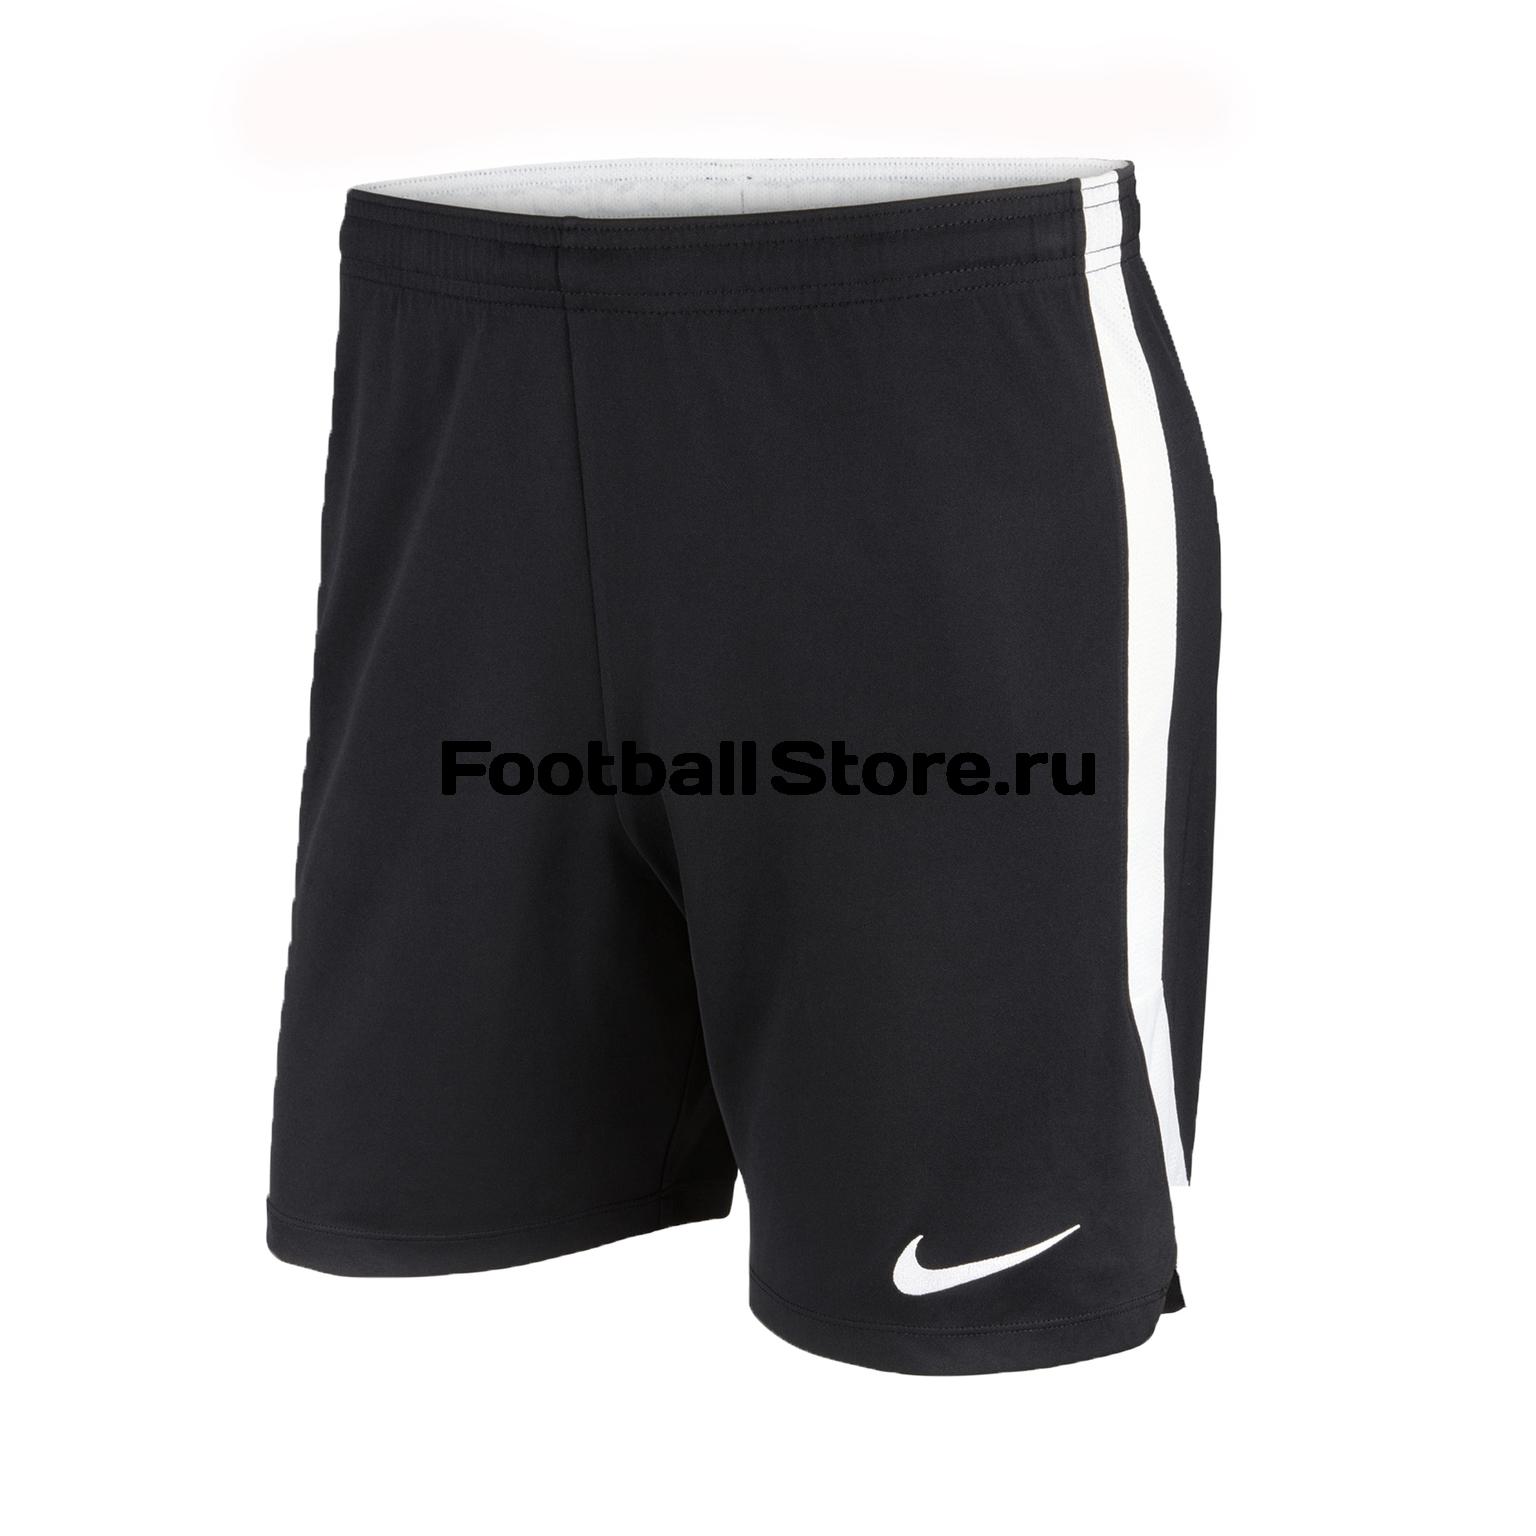 4ebcf2e5 Шорты Nike Dry Classic AJ1235-010 – купить в интернет магазине ...